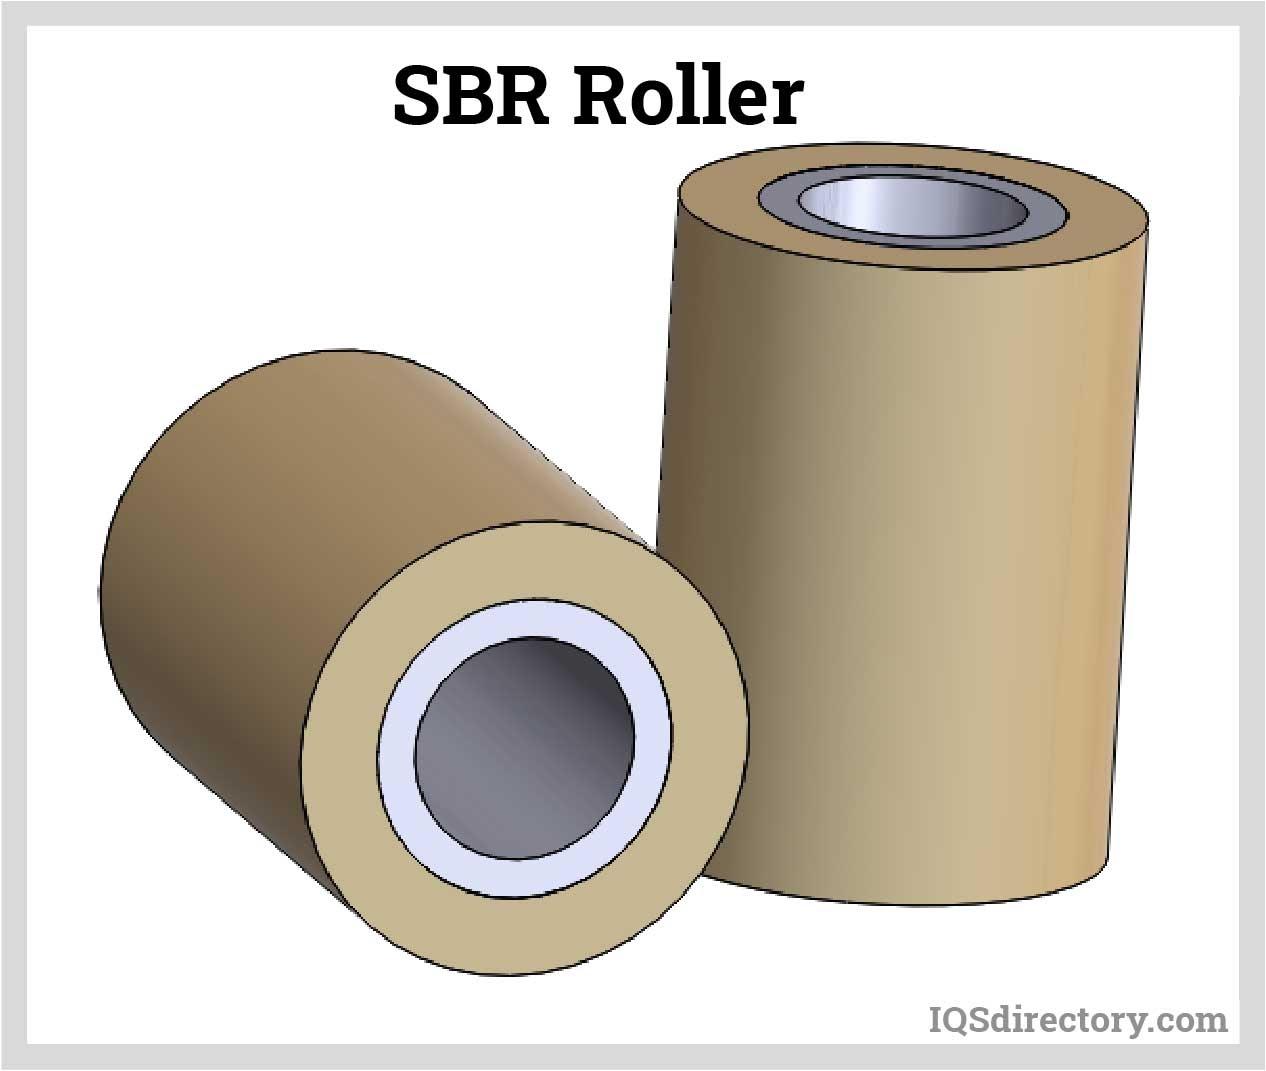 SBR Roller